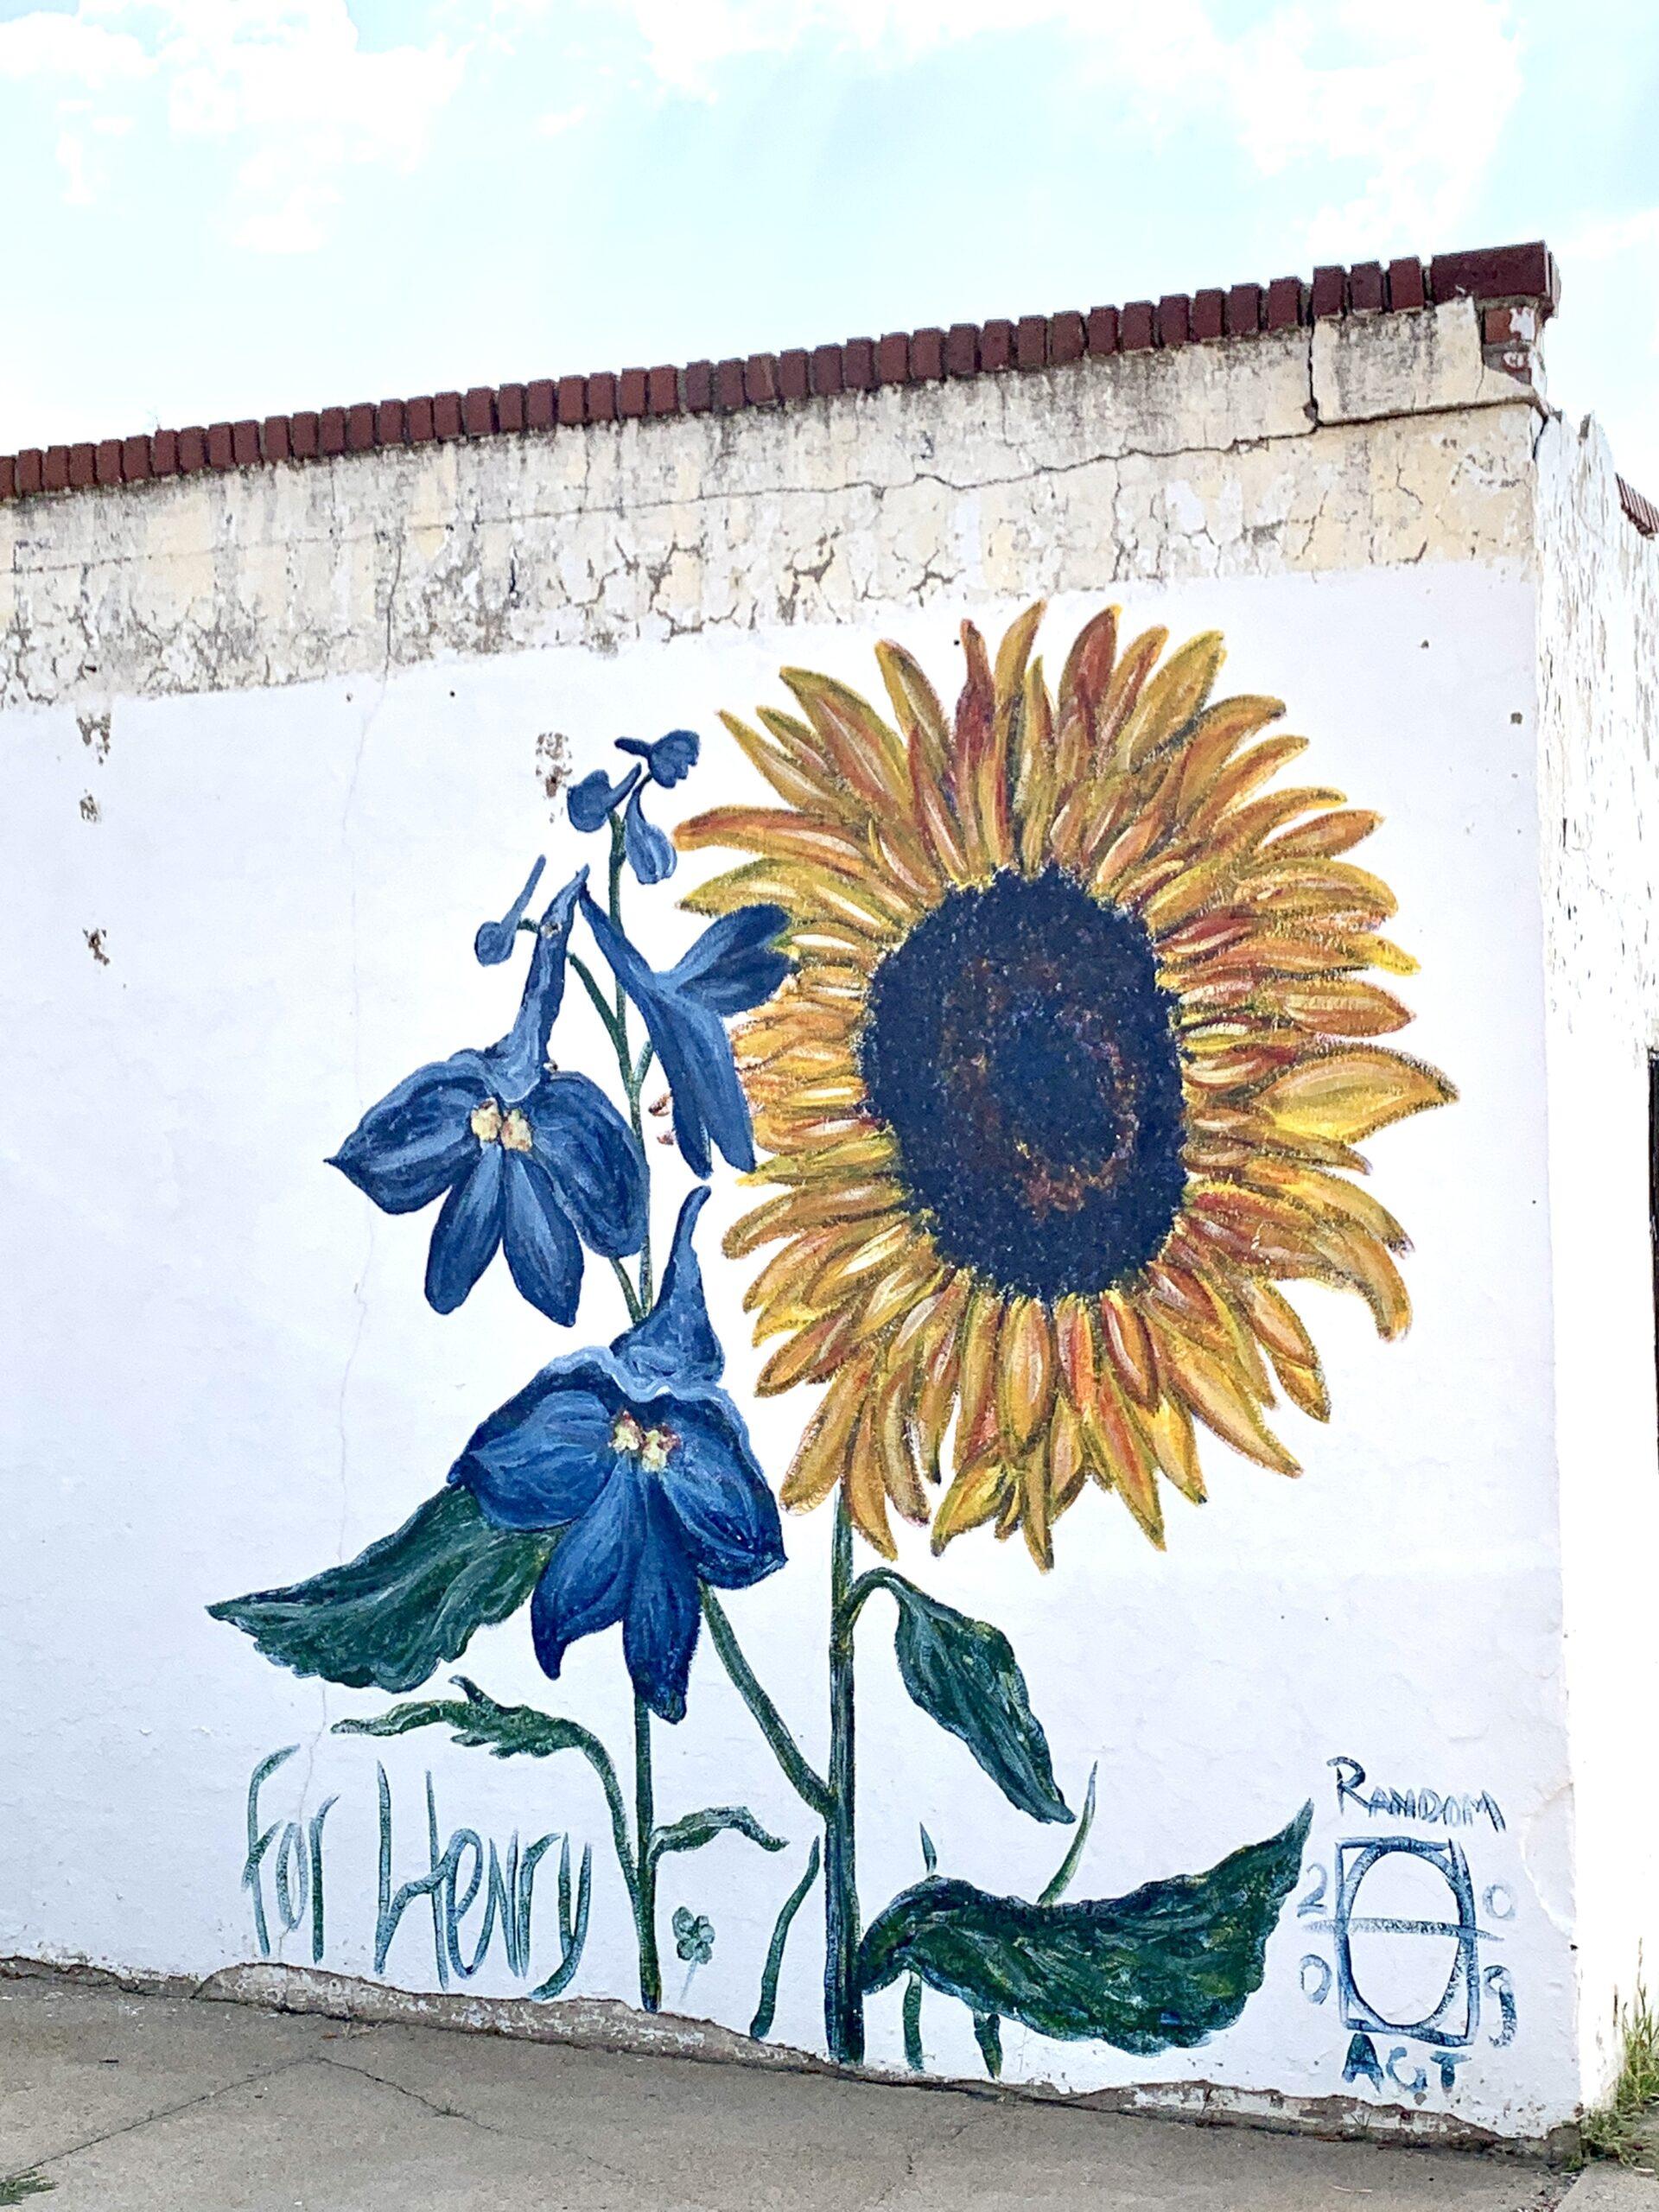 Hays Street Art